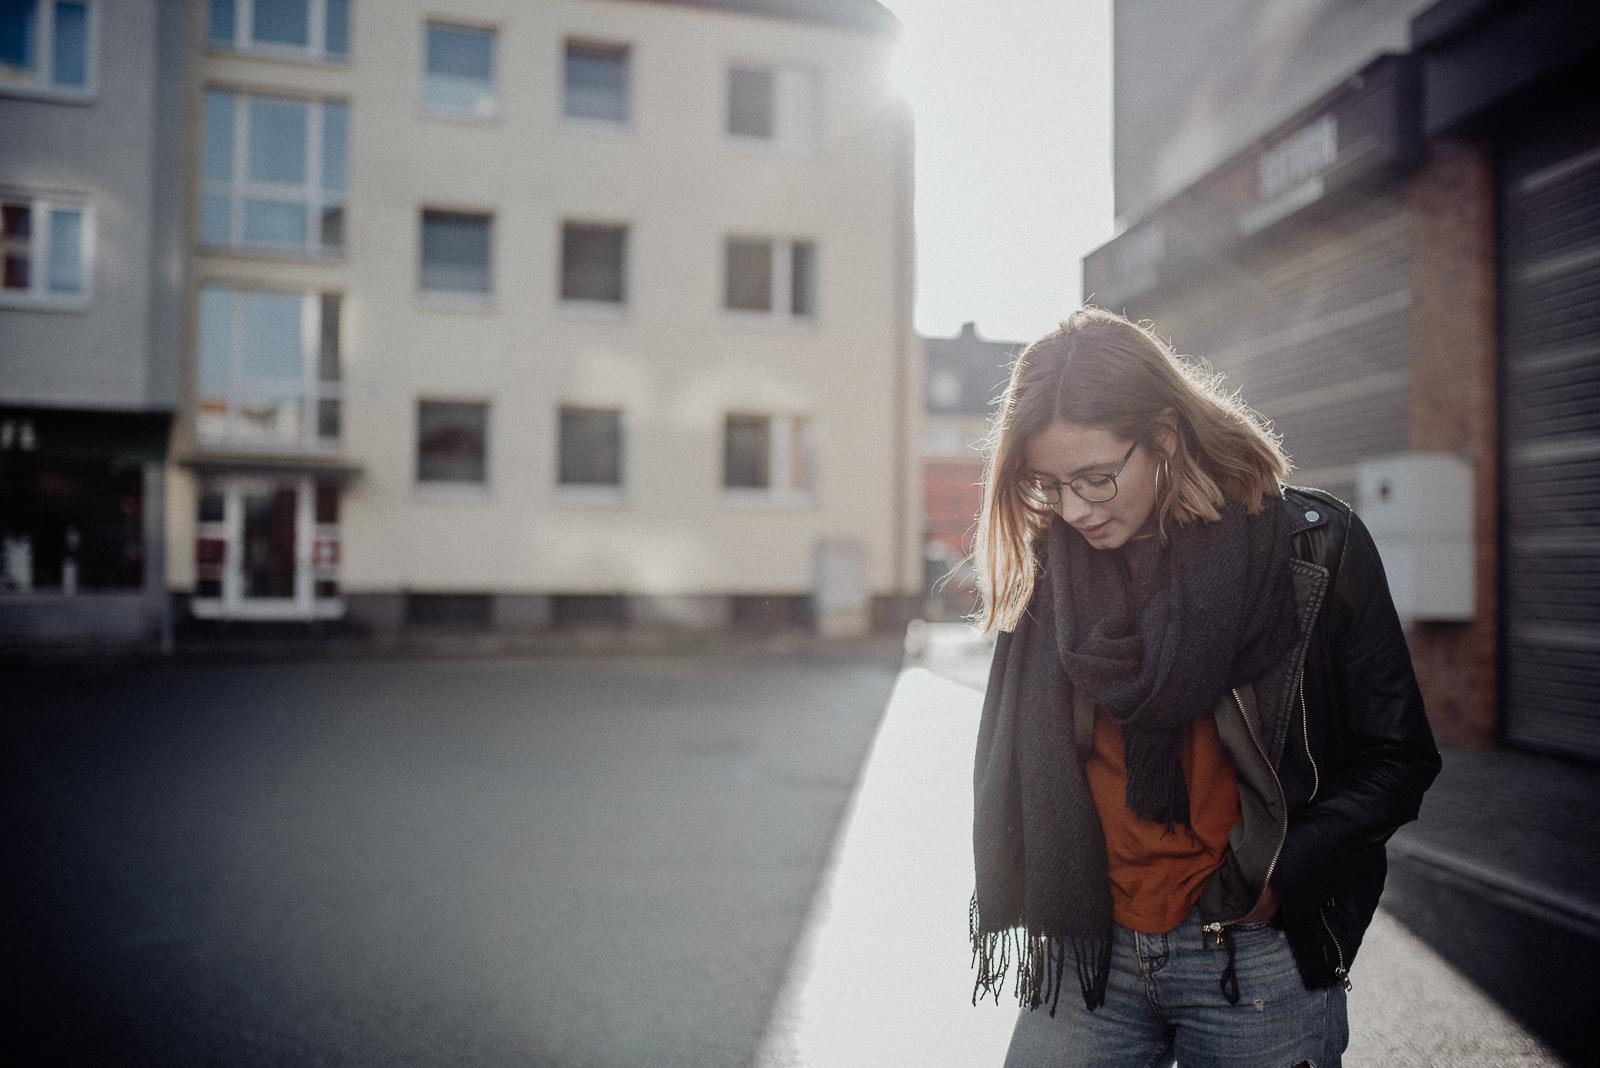 017-designparaplus-fotografin-witten-portrait-shooting-downtown